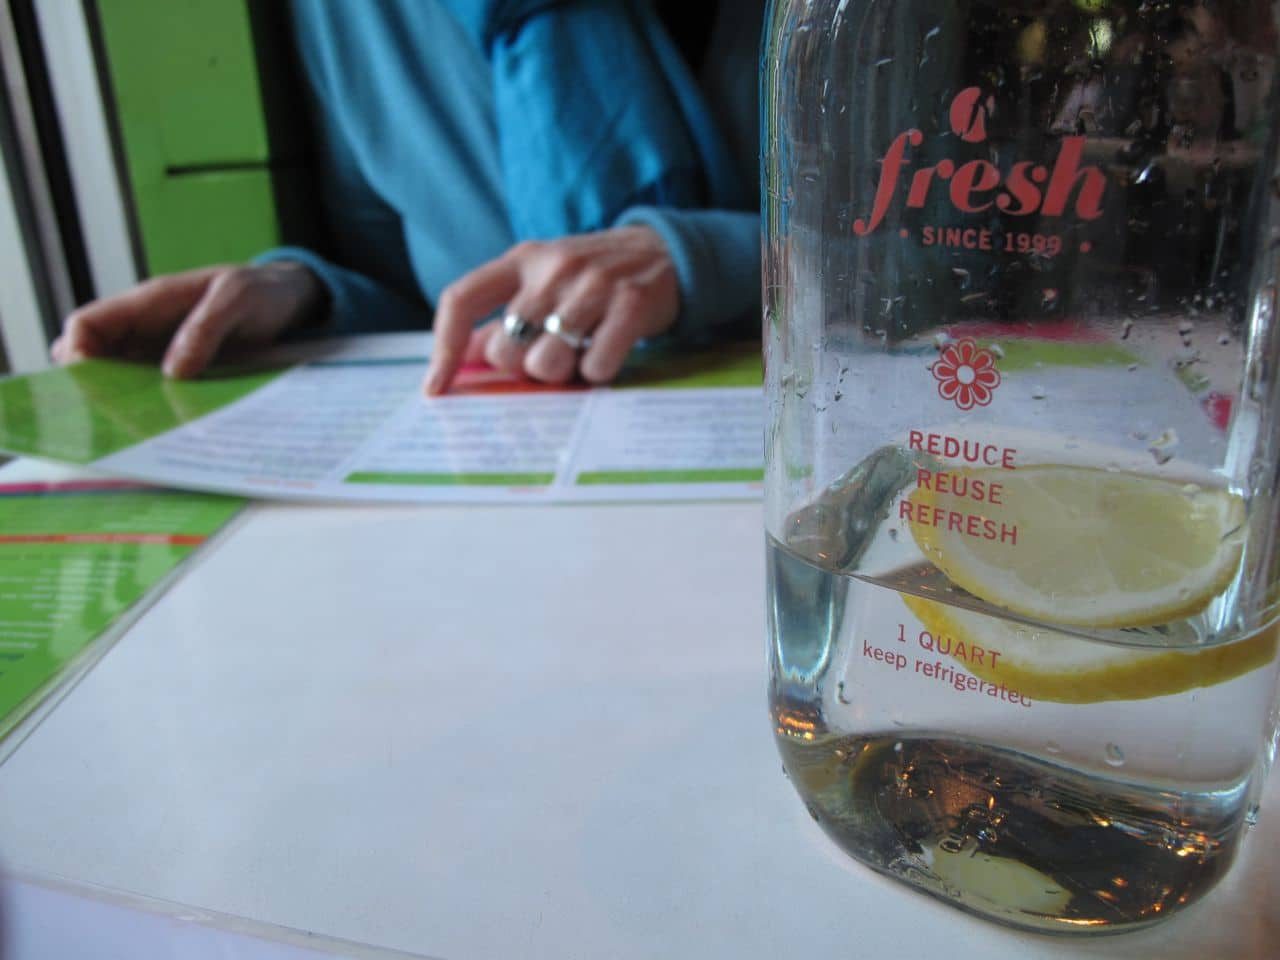 Perusing the menu at Fresh Restaurant Toronto.